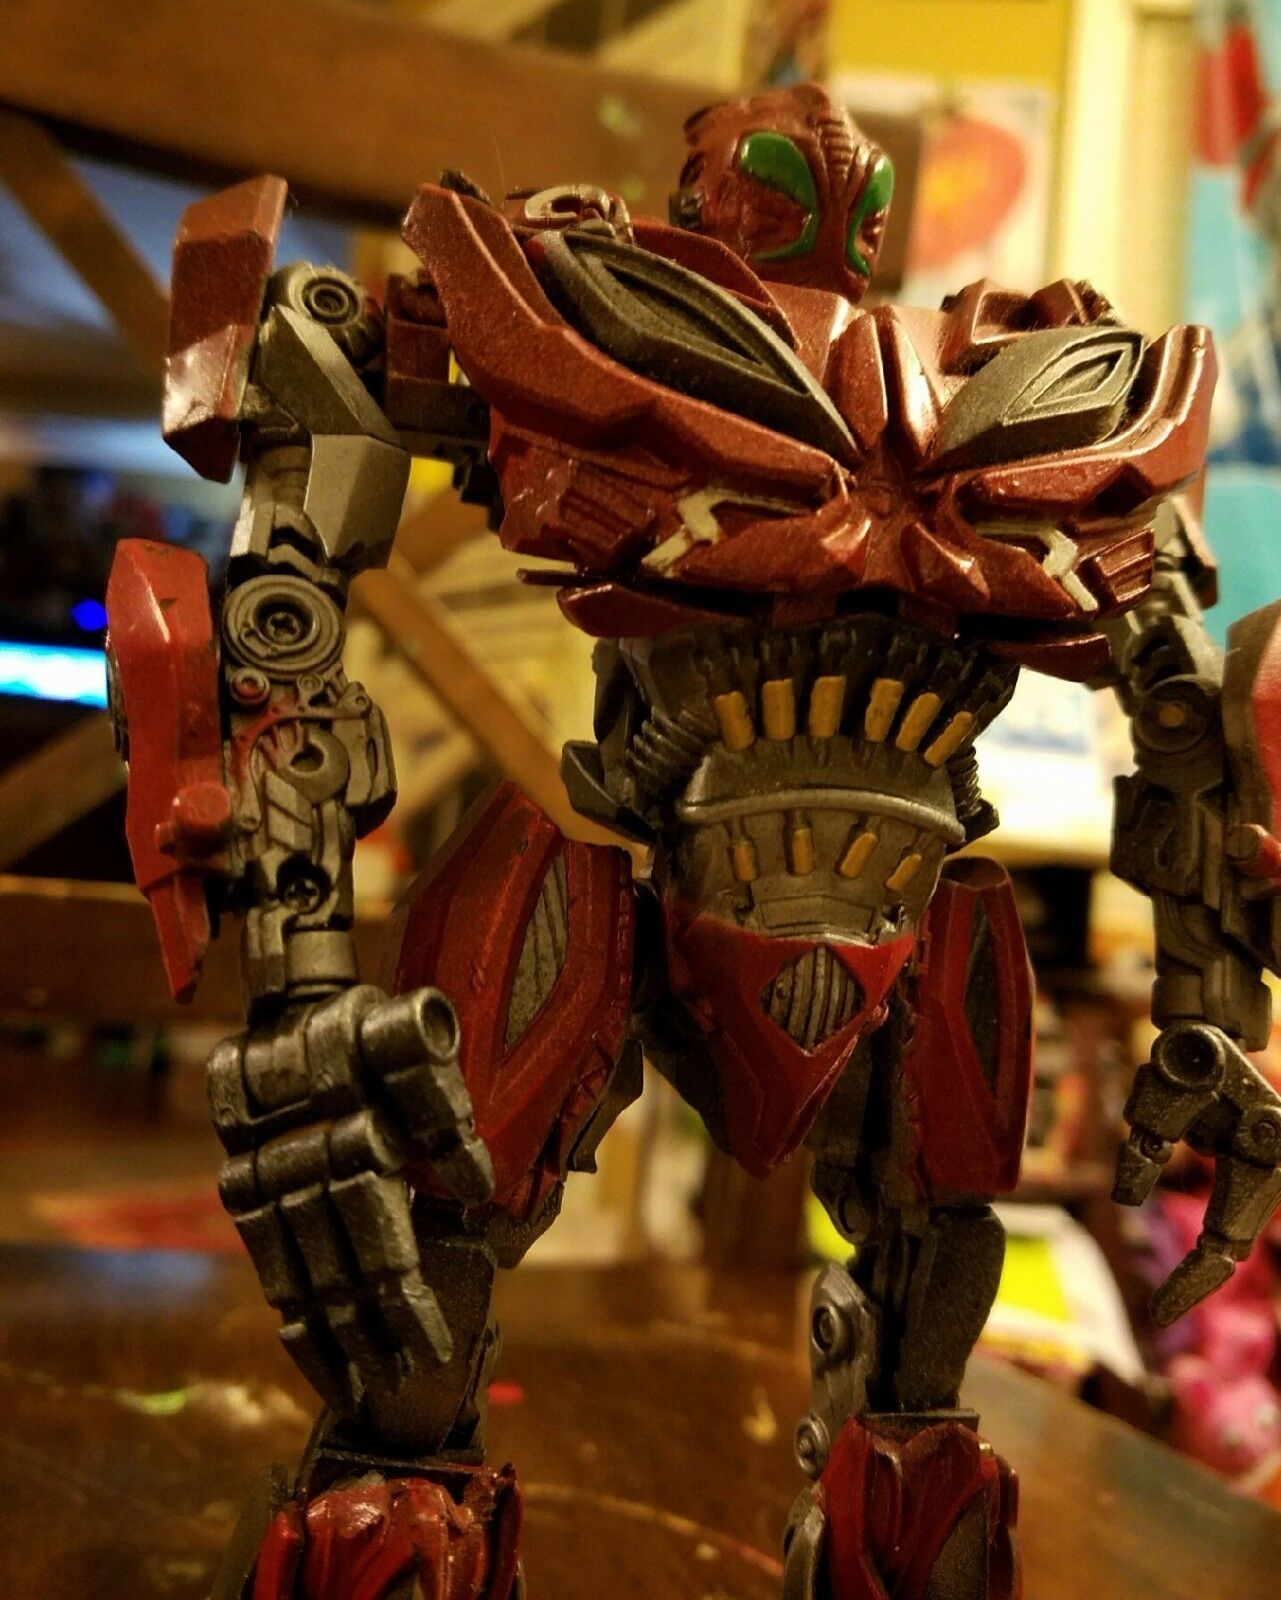 Personalizado Transformers-Personalizado Voyager Class Rojo Metálico Stinger